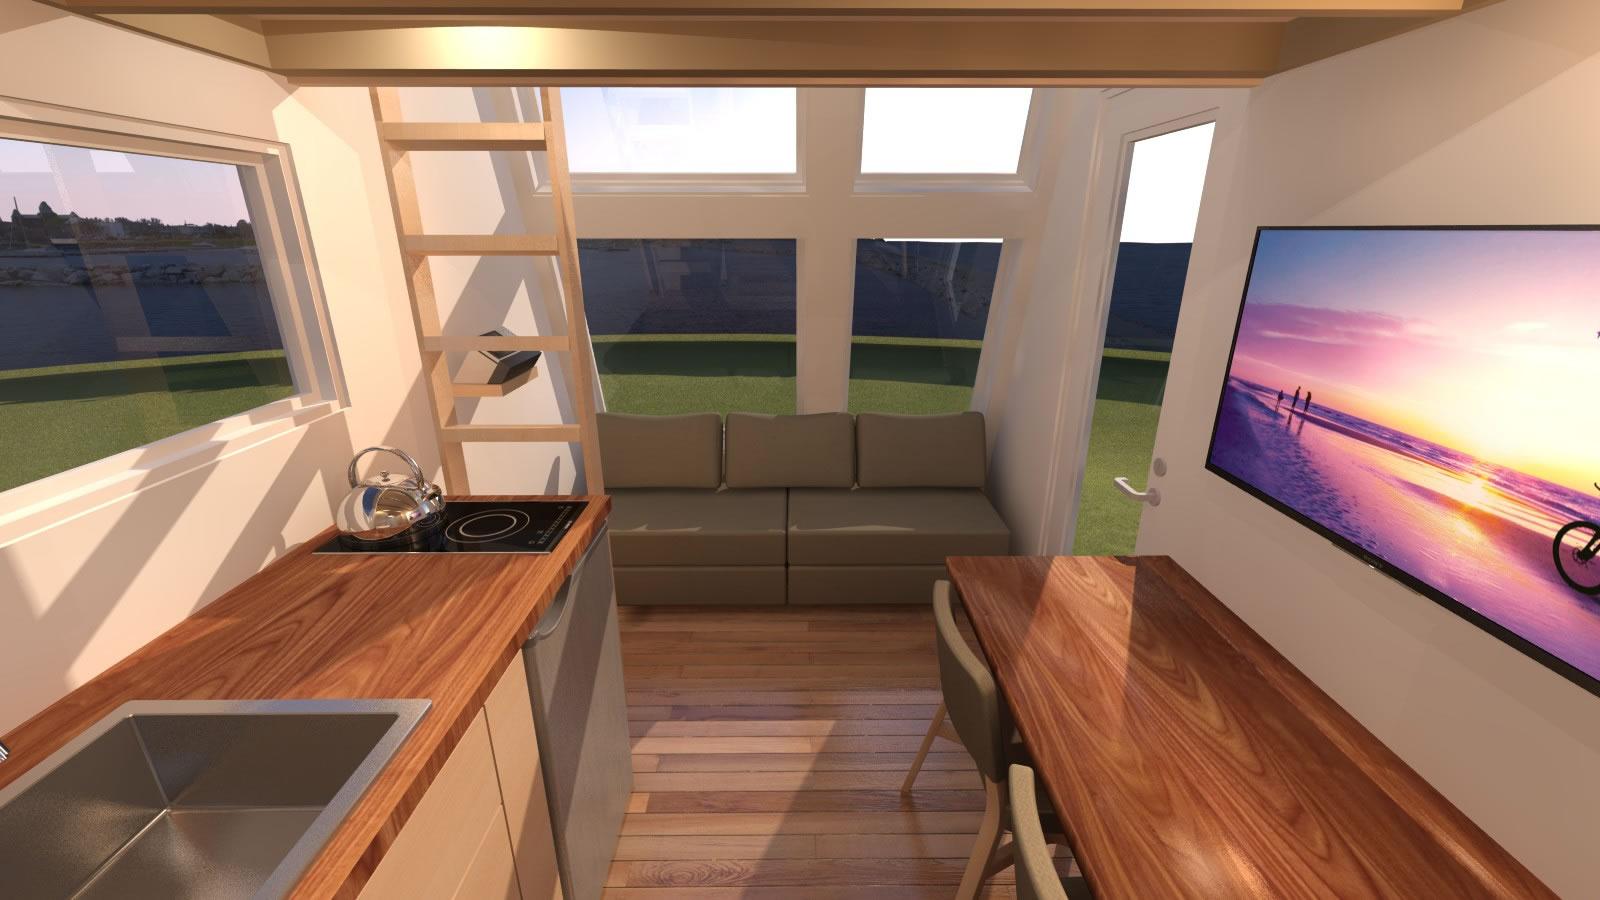 Anchor Bay 16 Tiny House - Living Room